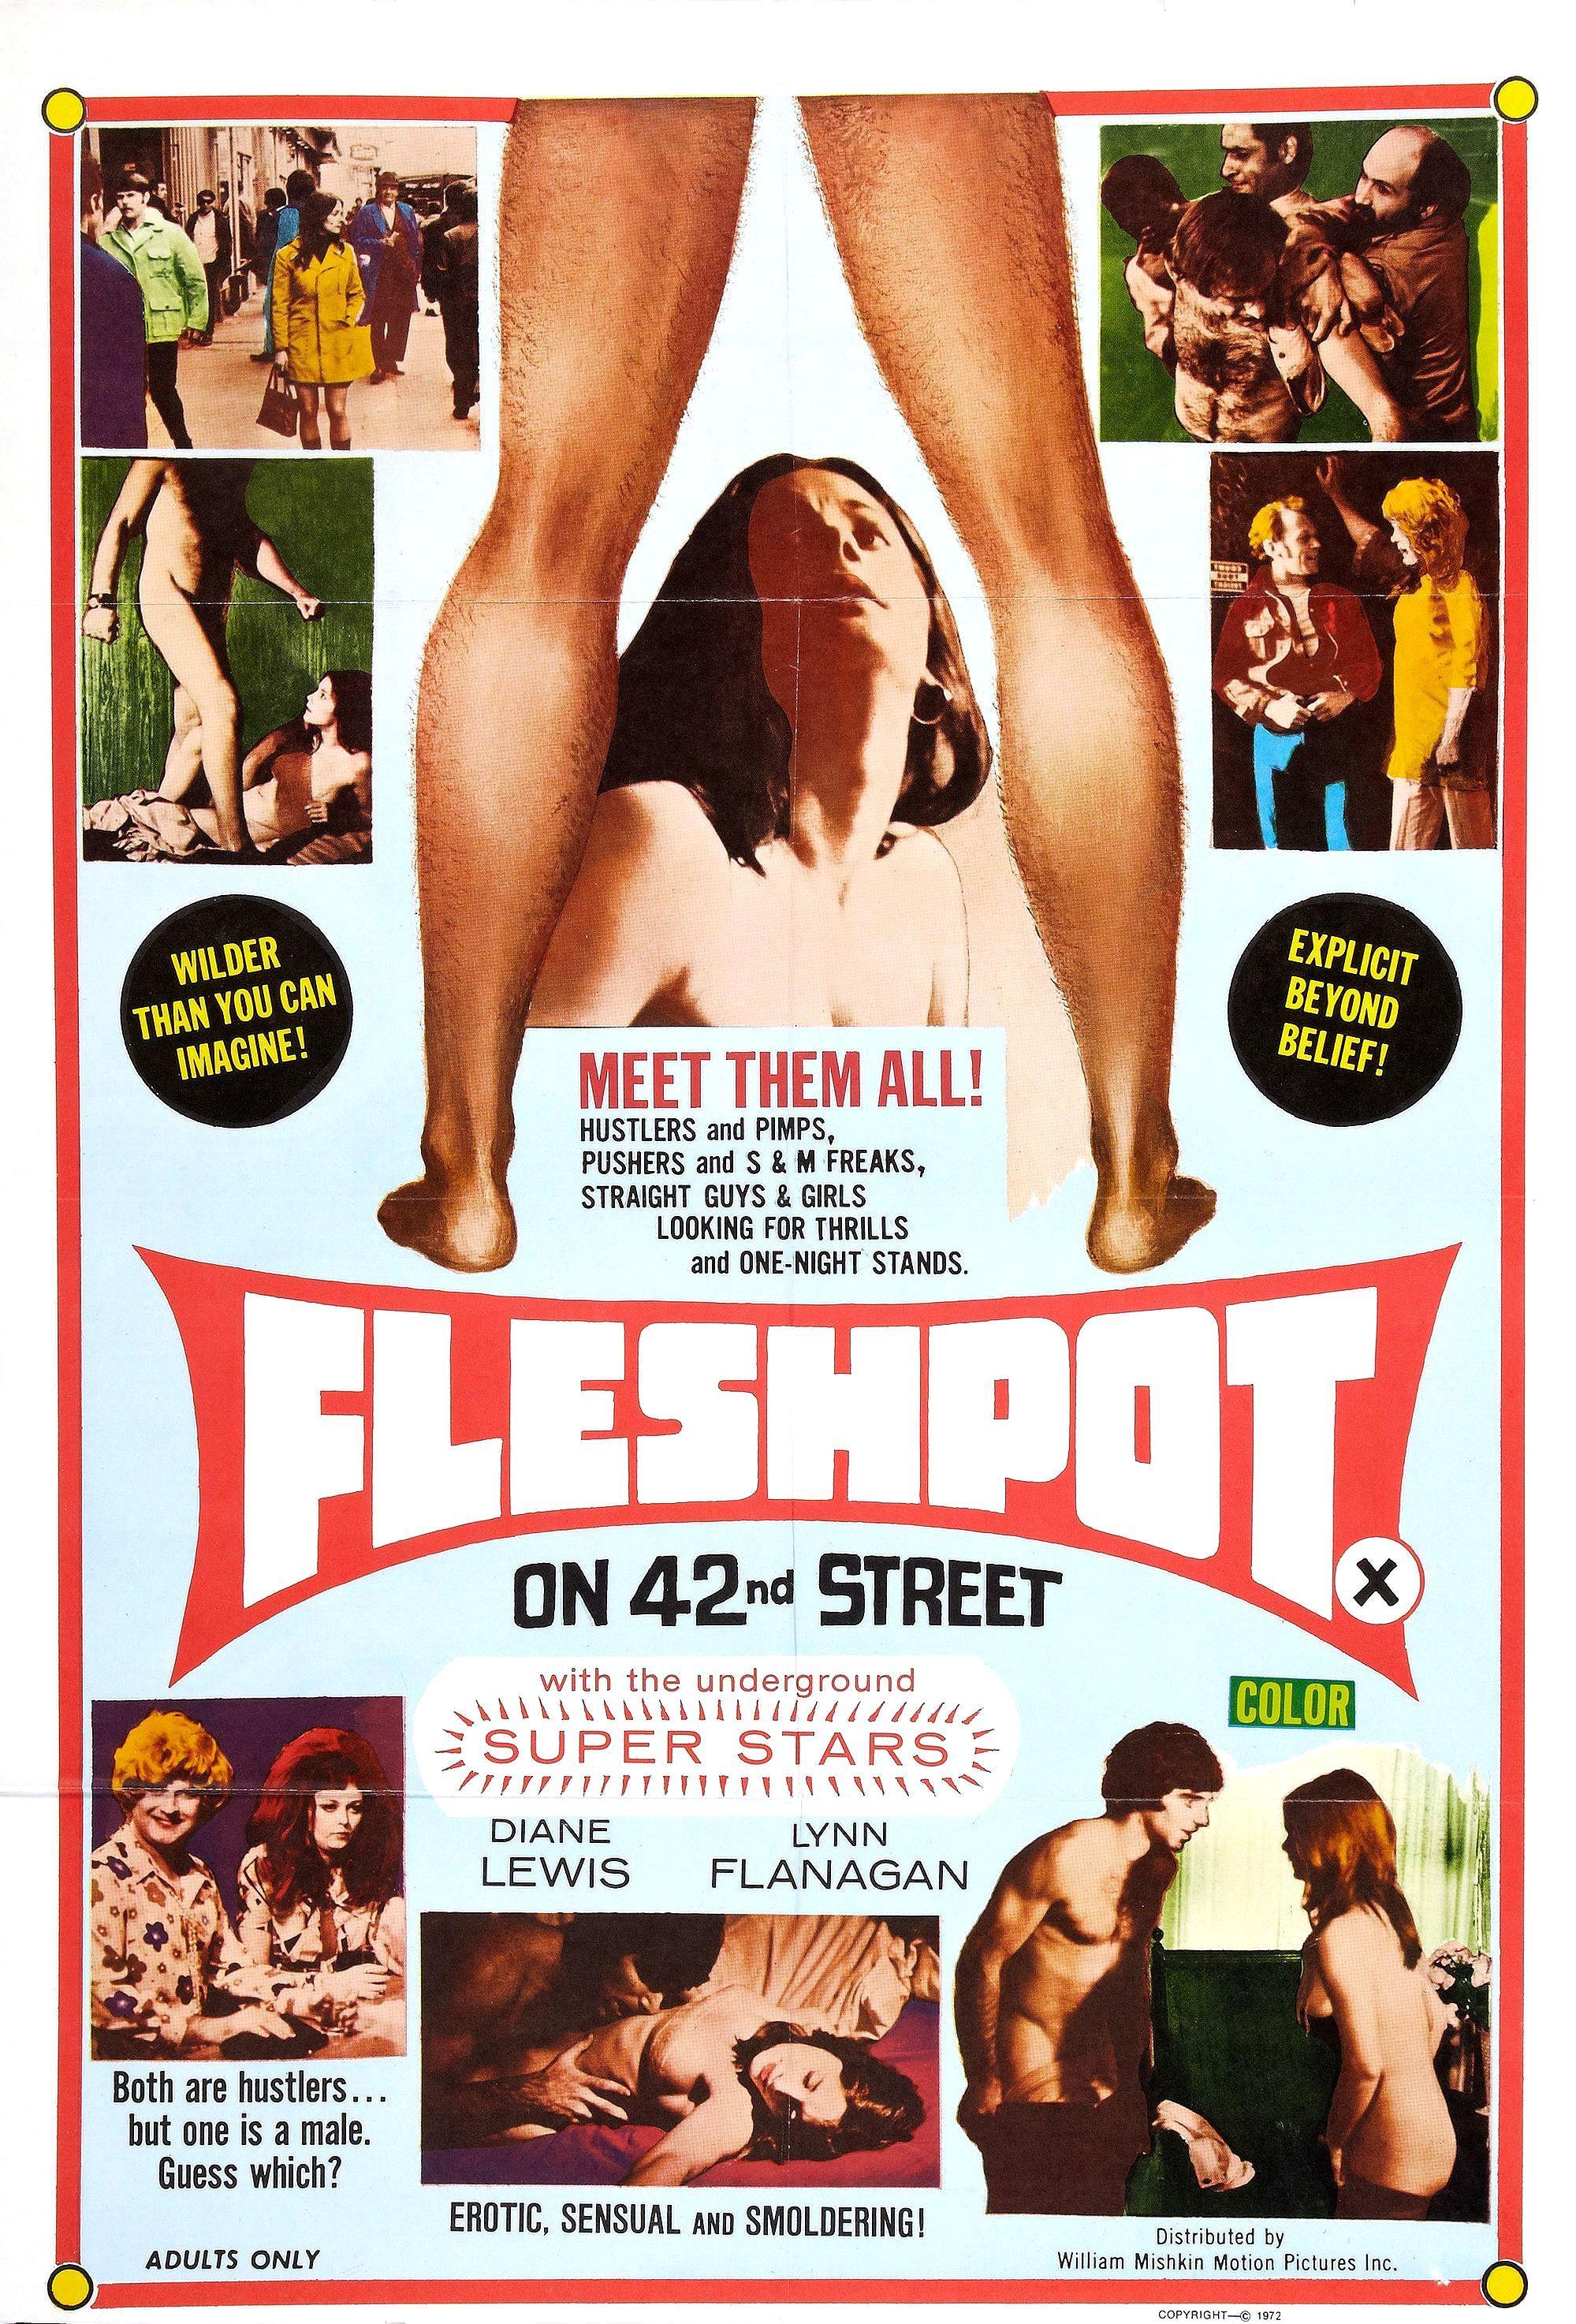 Fleshpot on 42nd st